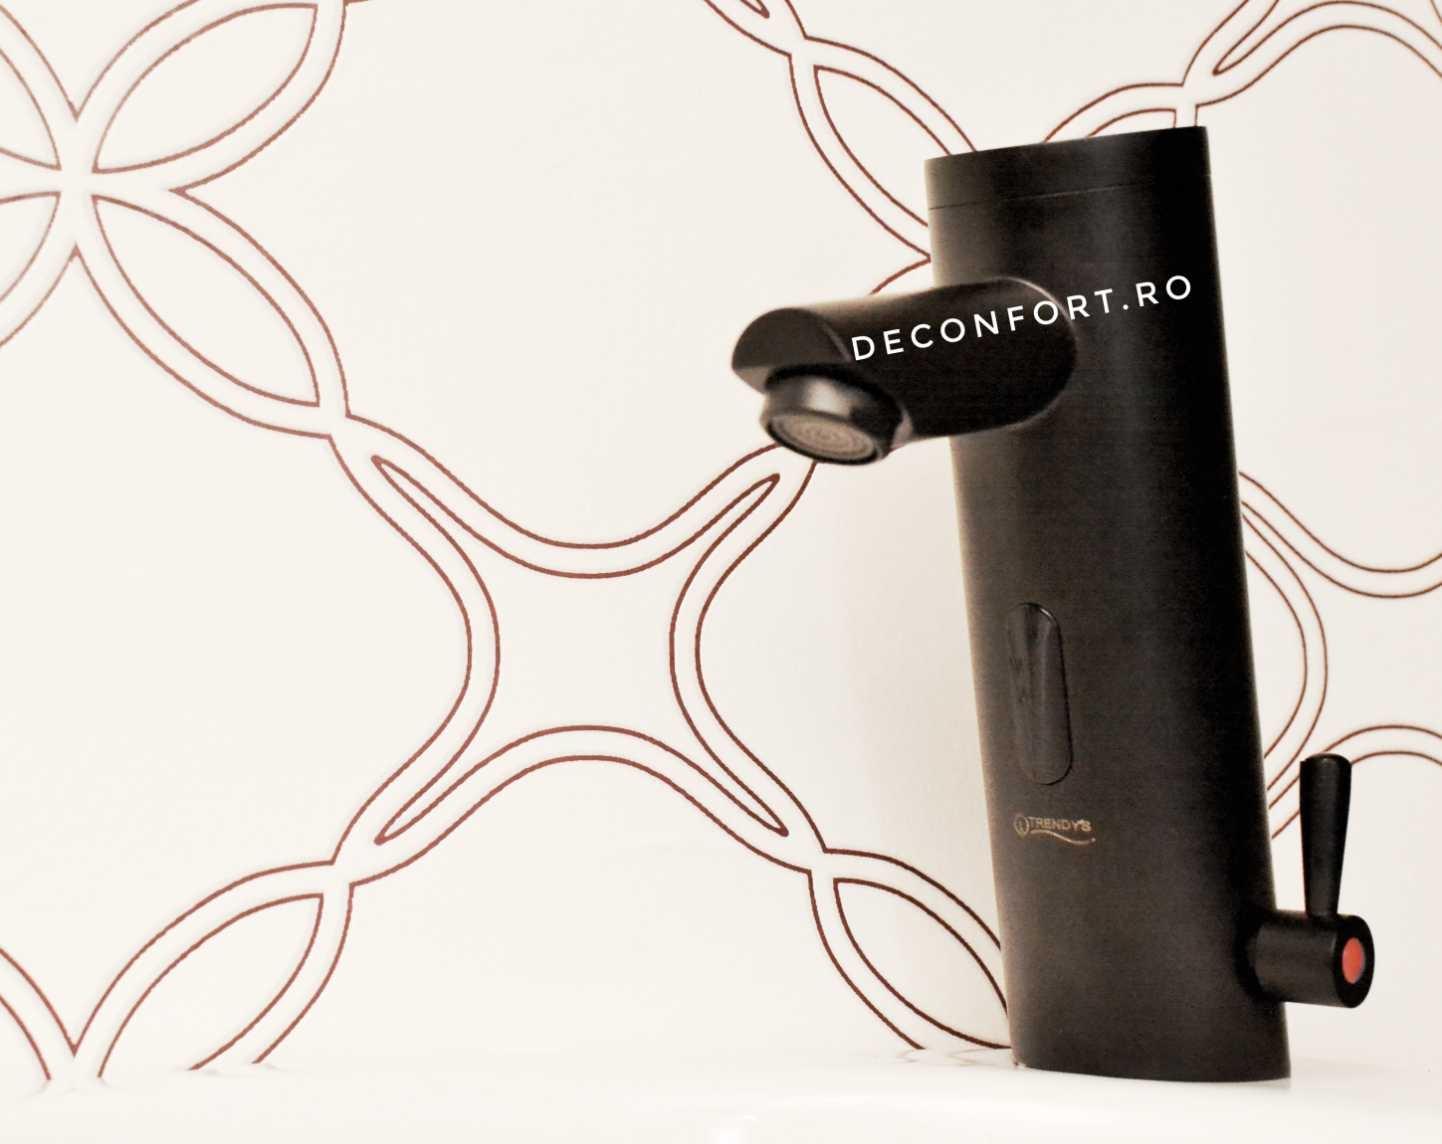 Sezor lavoar automat negru antichizat EasyFlow 6V reglare temperatura apa